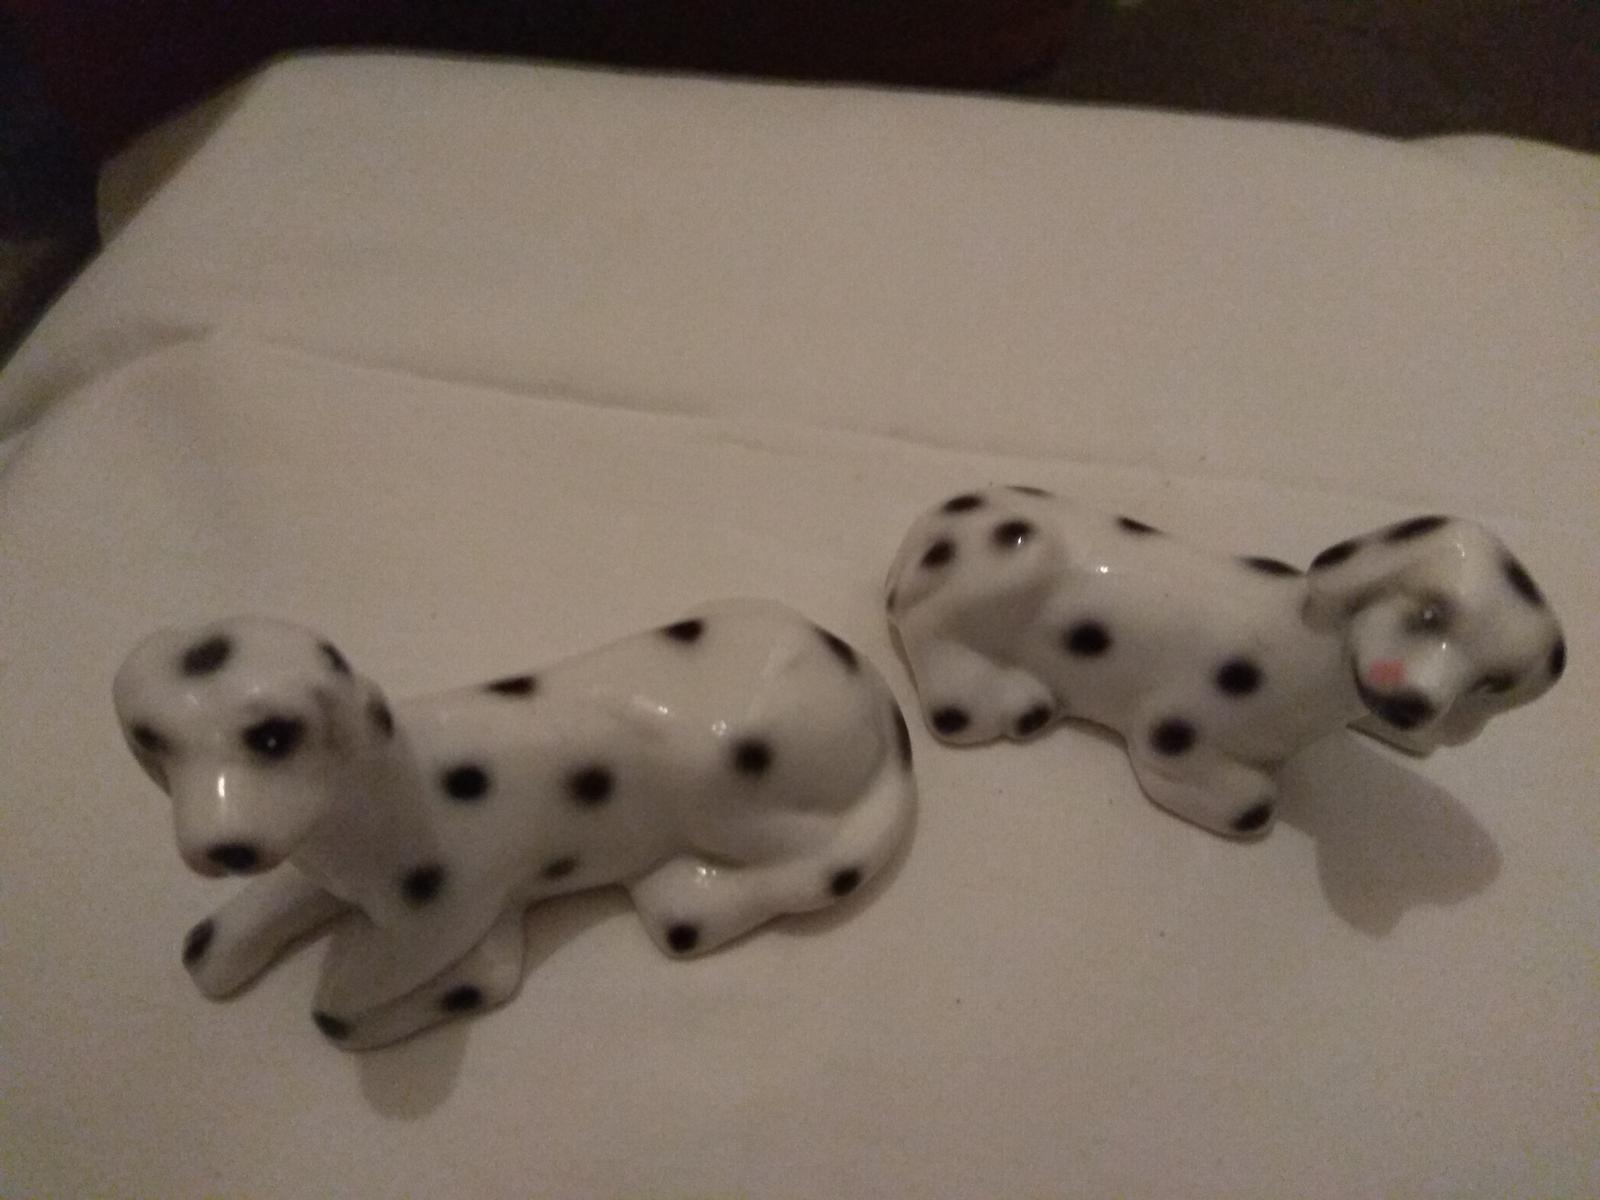 sošky psíkov - Obrázok č. 1